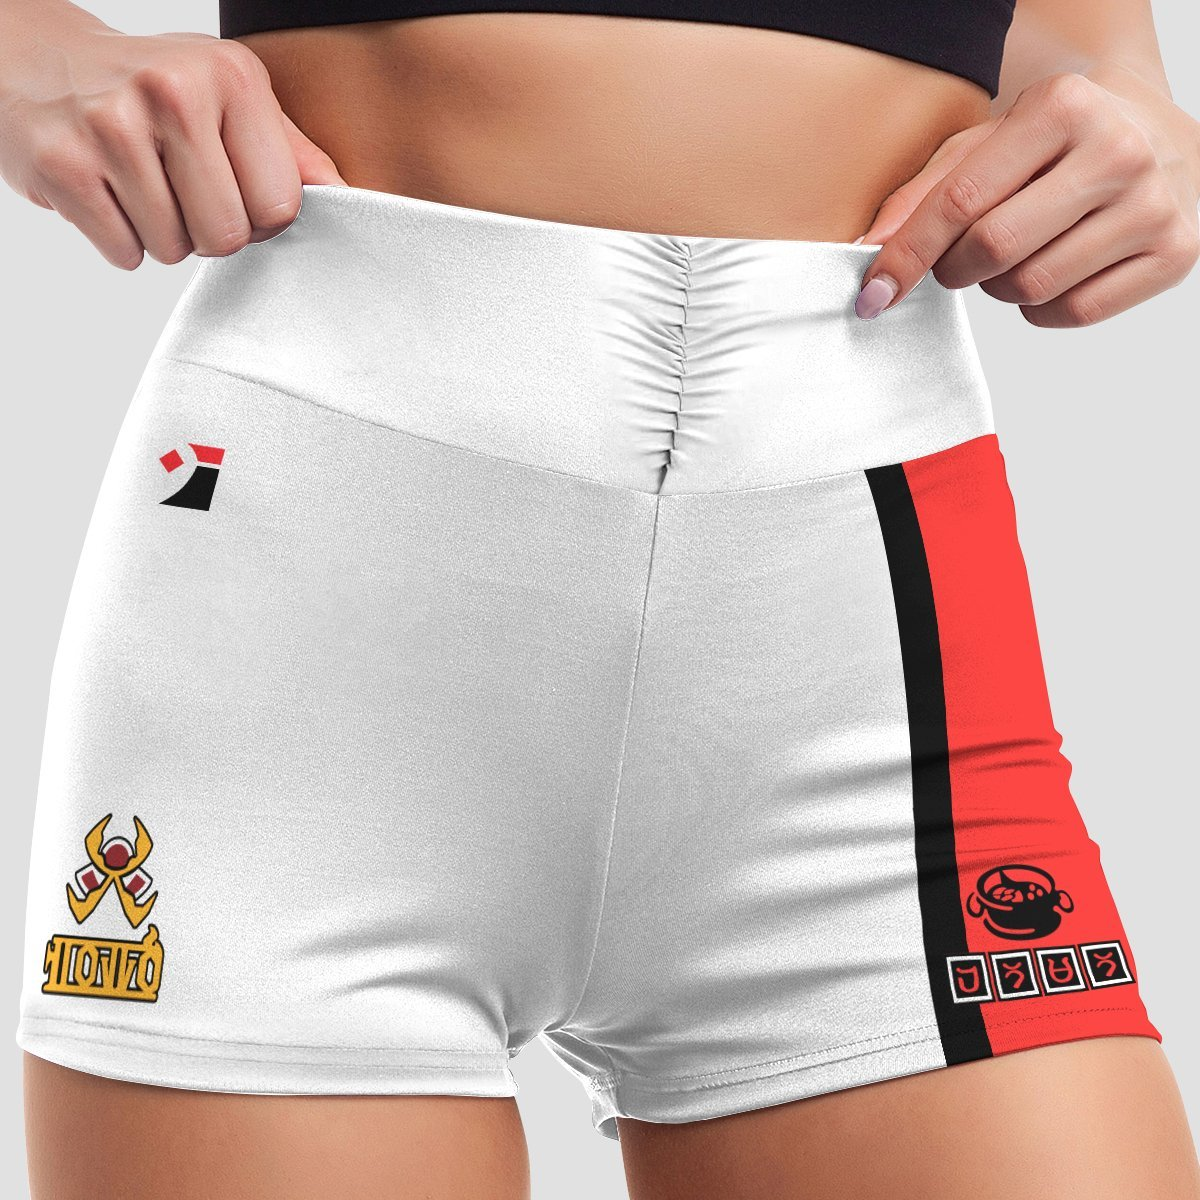 pokemon fire uniform active wear set 139727 - Anime Swimsuits